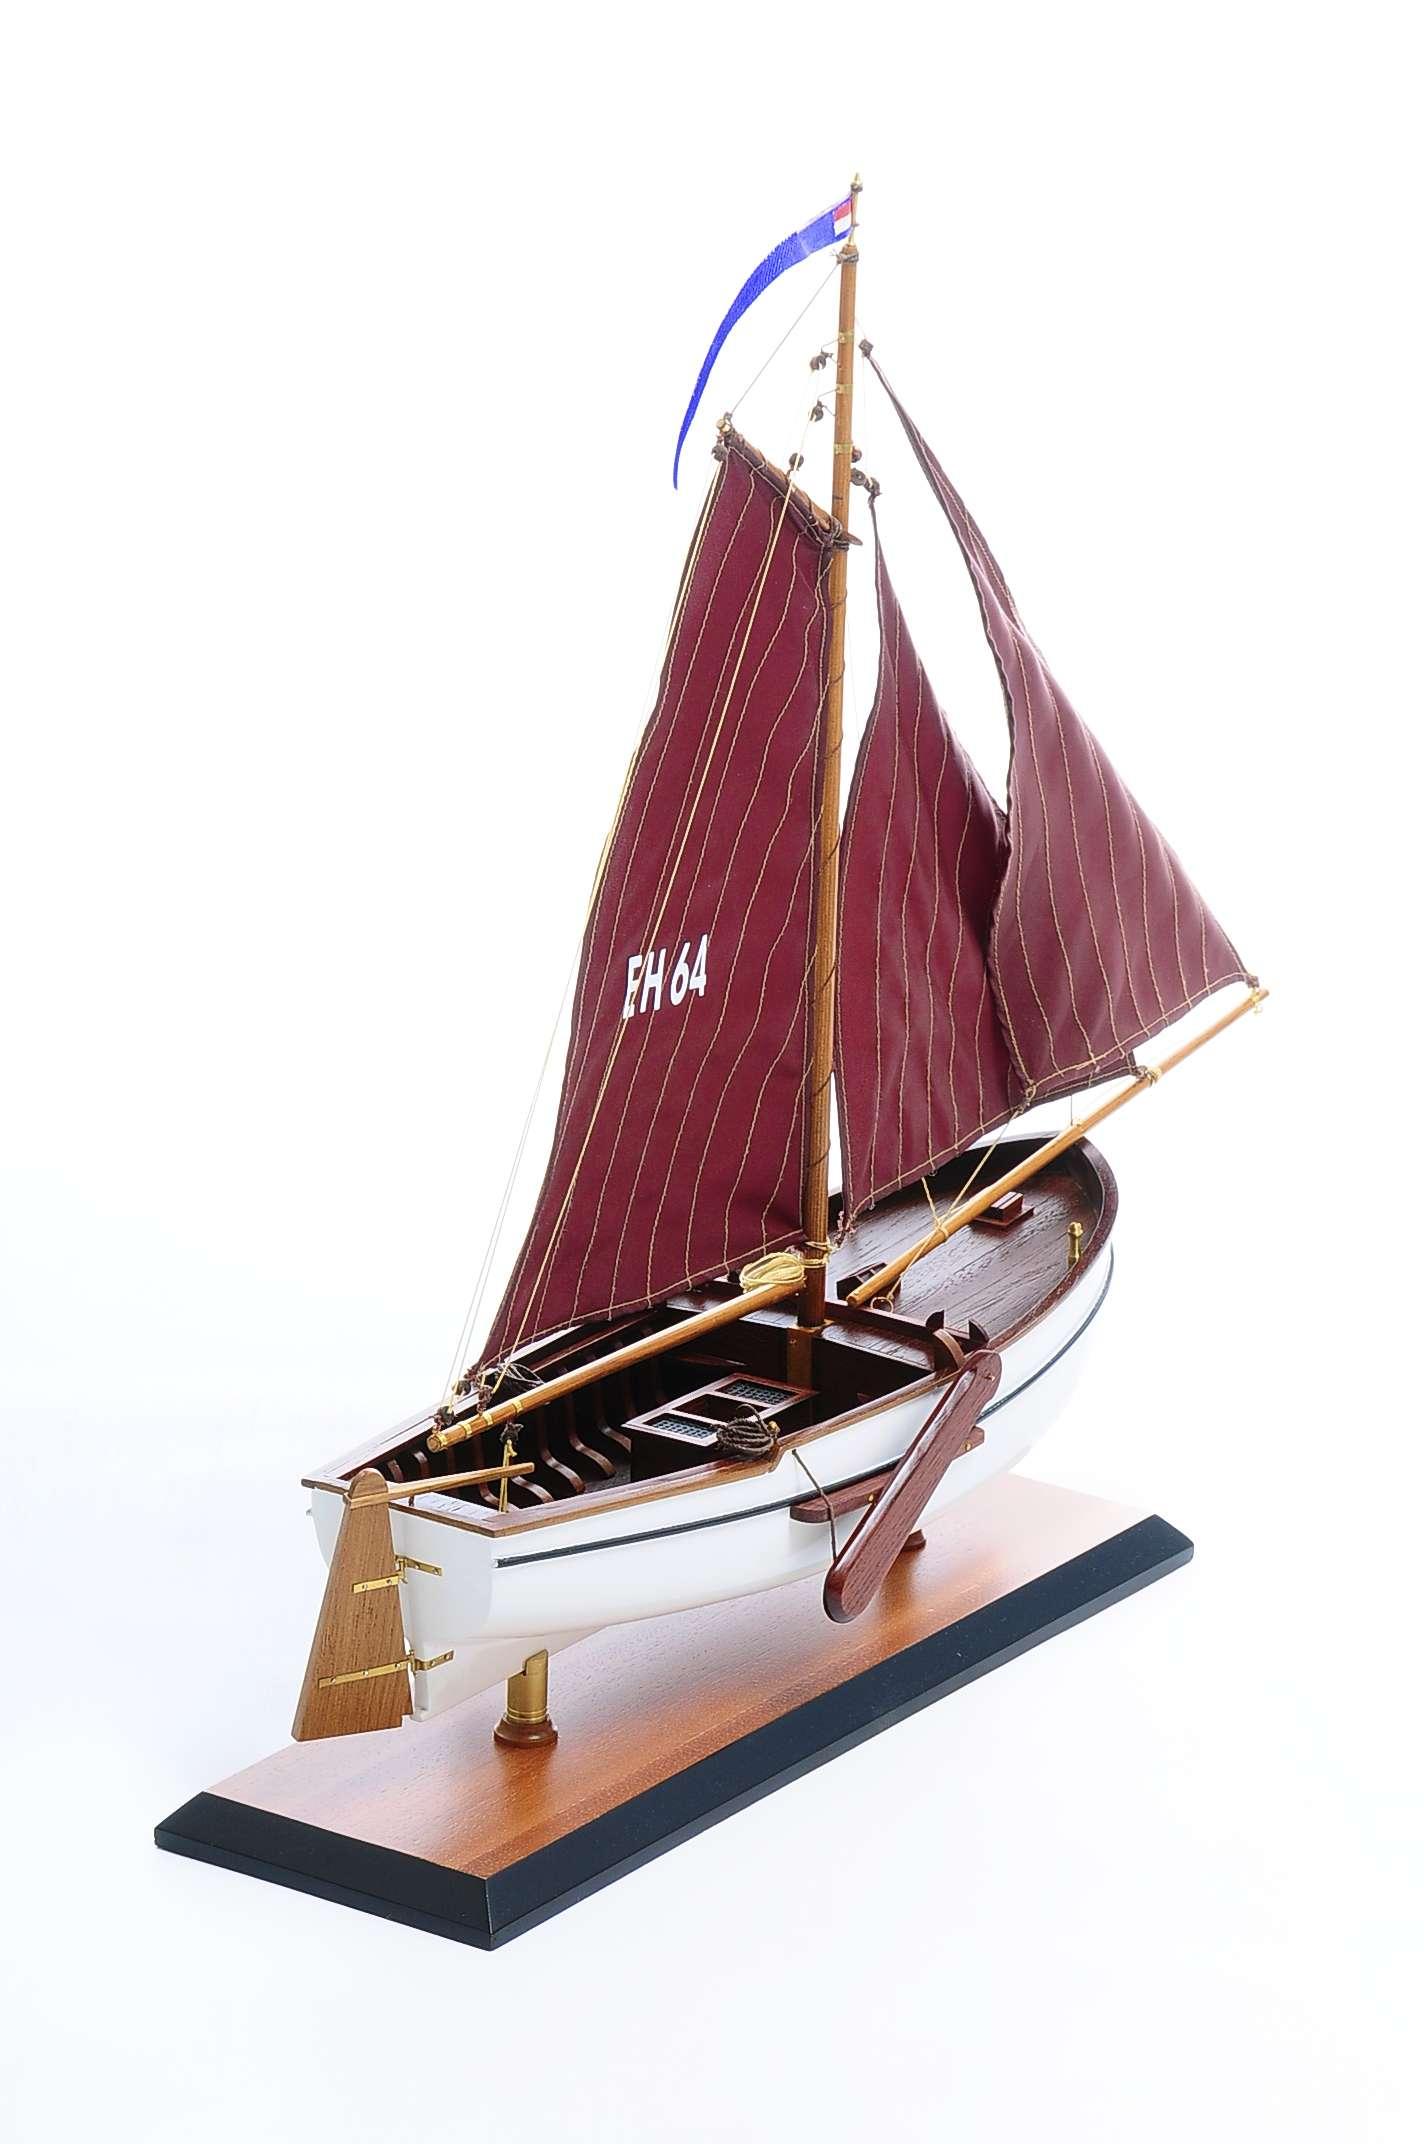 1432-4573-Dutch-Marker-Roundbow-Model-Boat